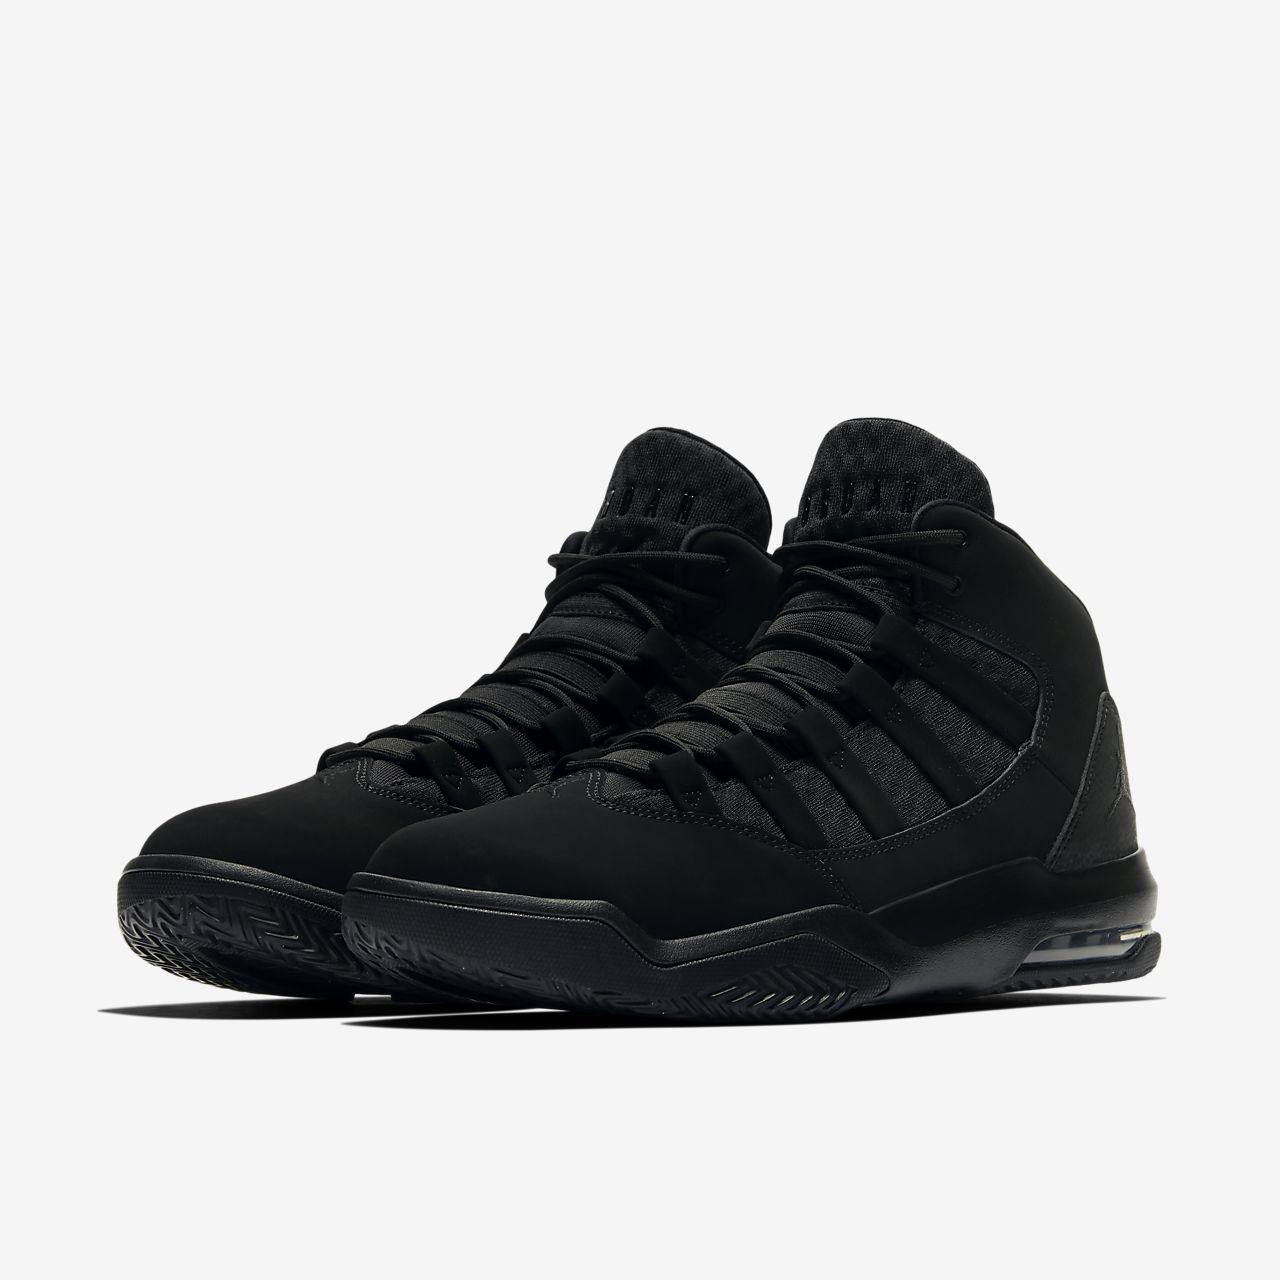 huge selection of 1f3f9 15657 Jordan Max Aura Men's Basketball Shoe